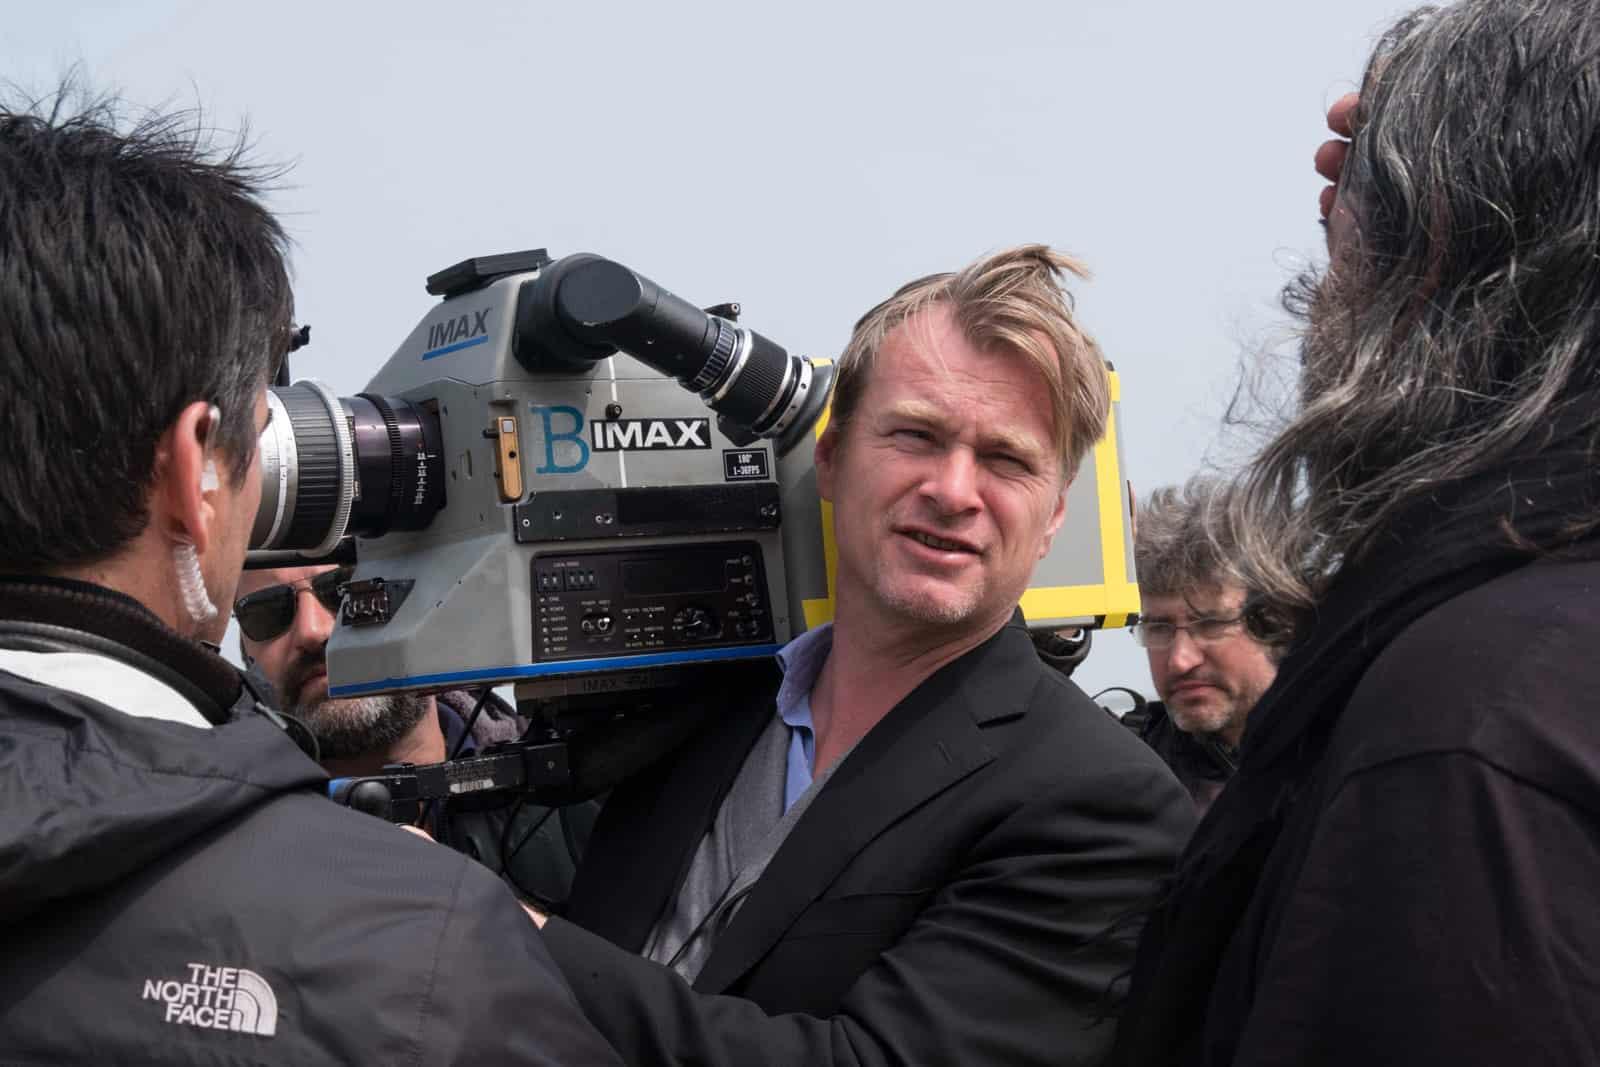 Director Chris Nolan during Dunkirk (2017), shot on IMAX 65mm and 65mm large-format film by DP Hoyte Van Hoytema FSF NSC ASC